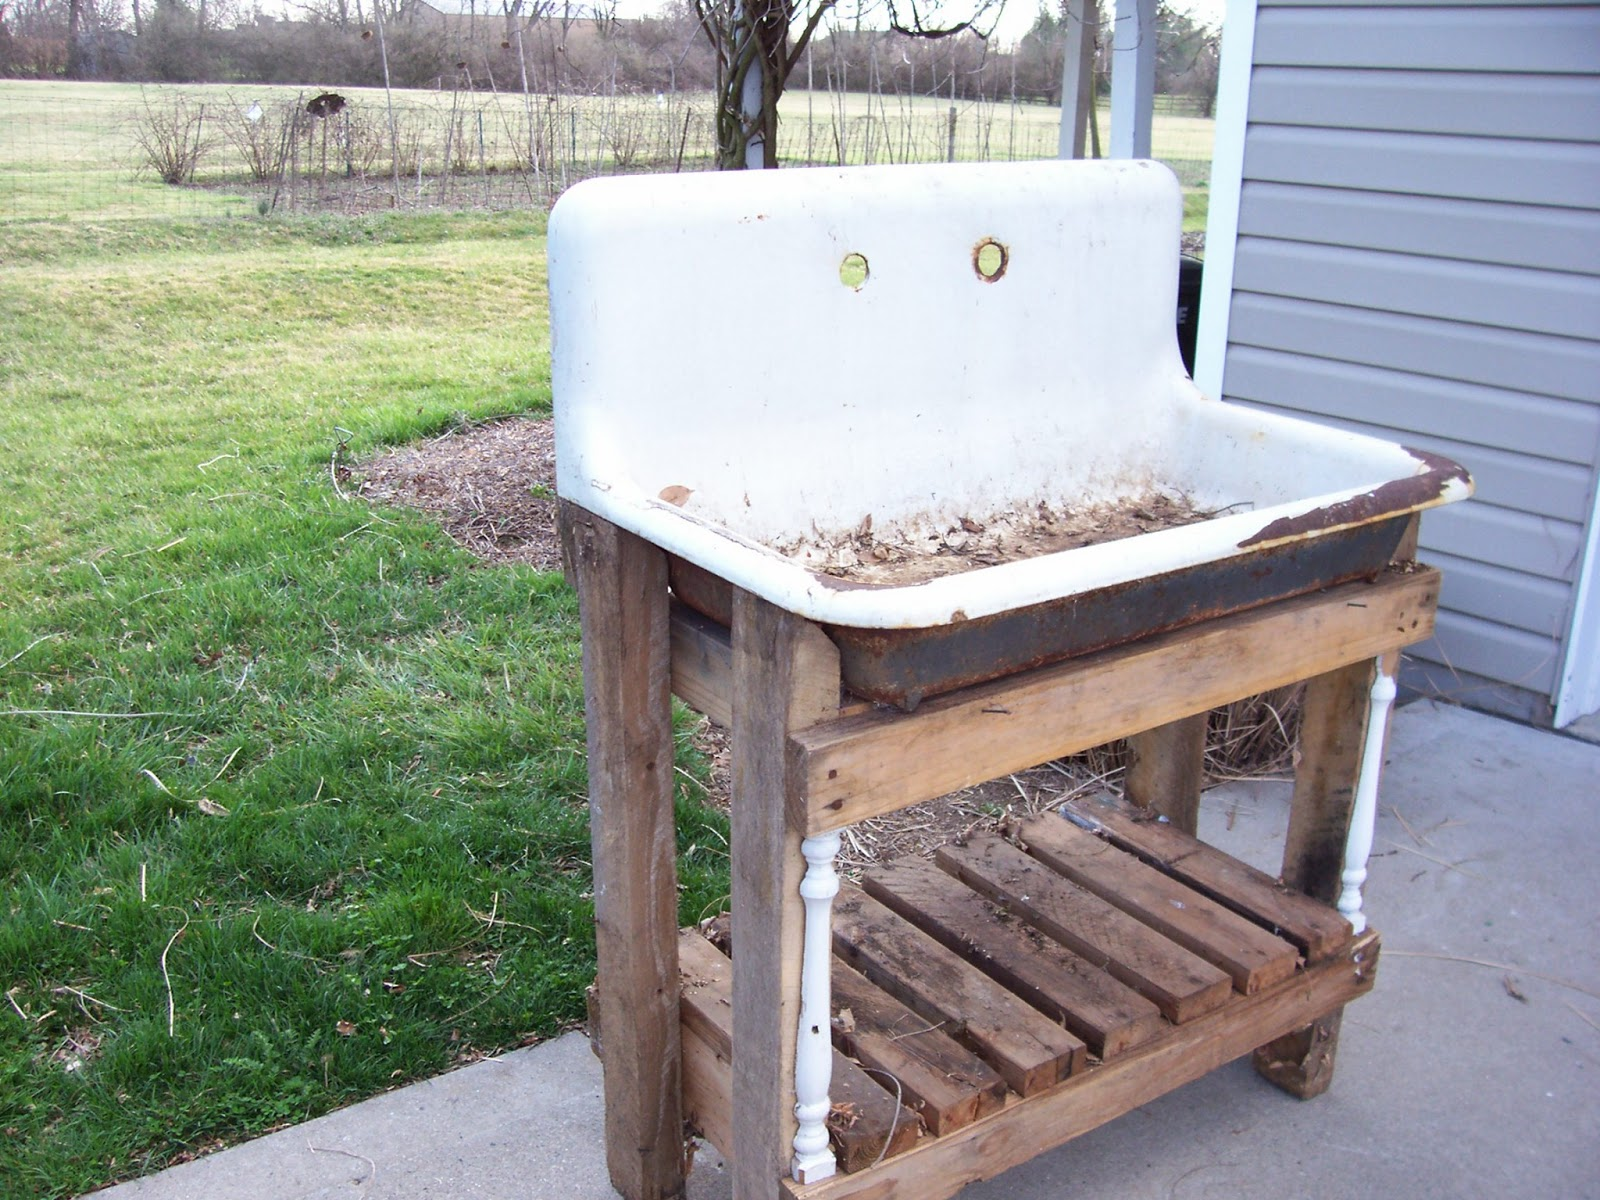 Sweet Vintage of Mine: RE-PURPOSED VINTAGE POTTING SINKS ... on Outdoor Patio Sink id=68025